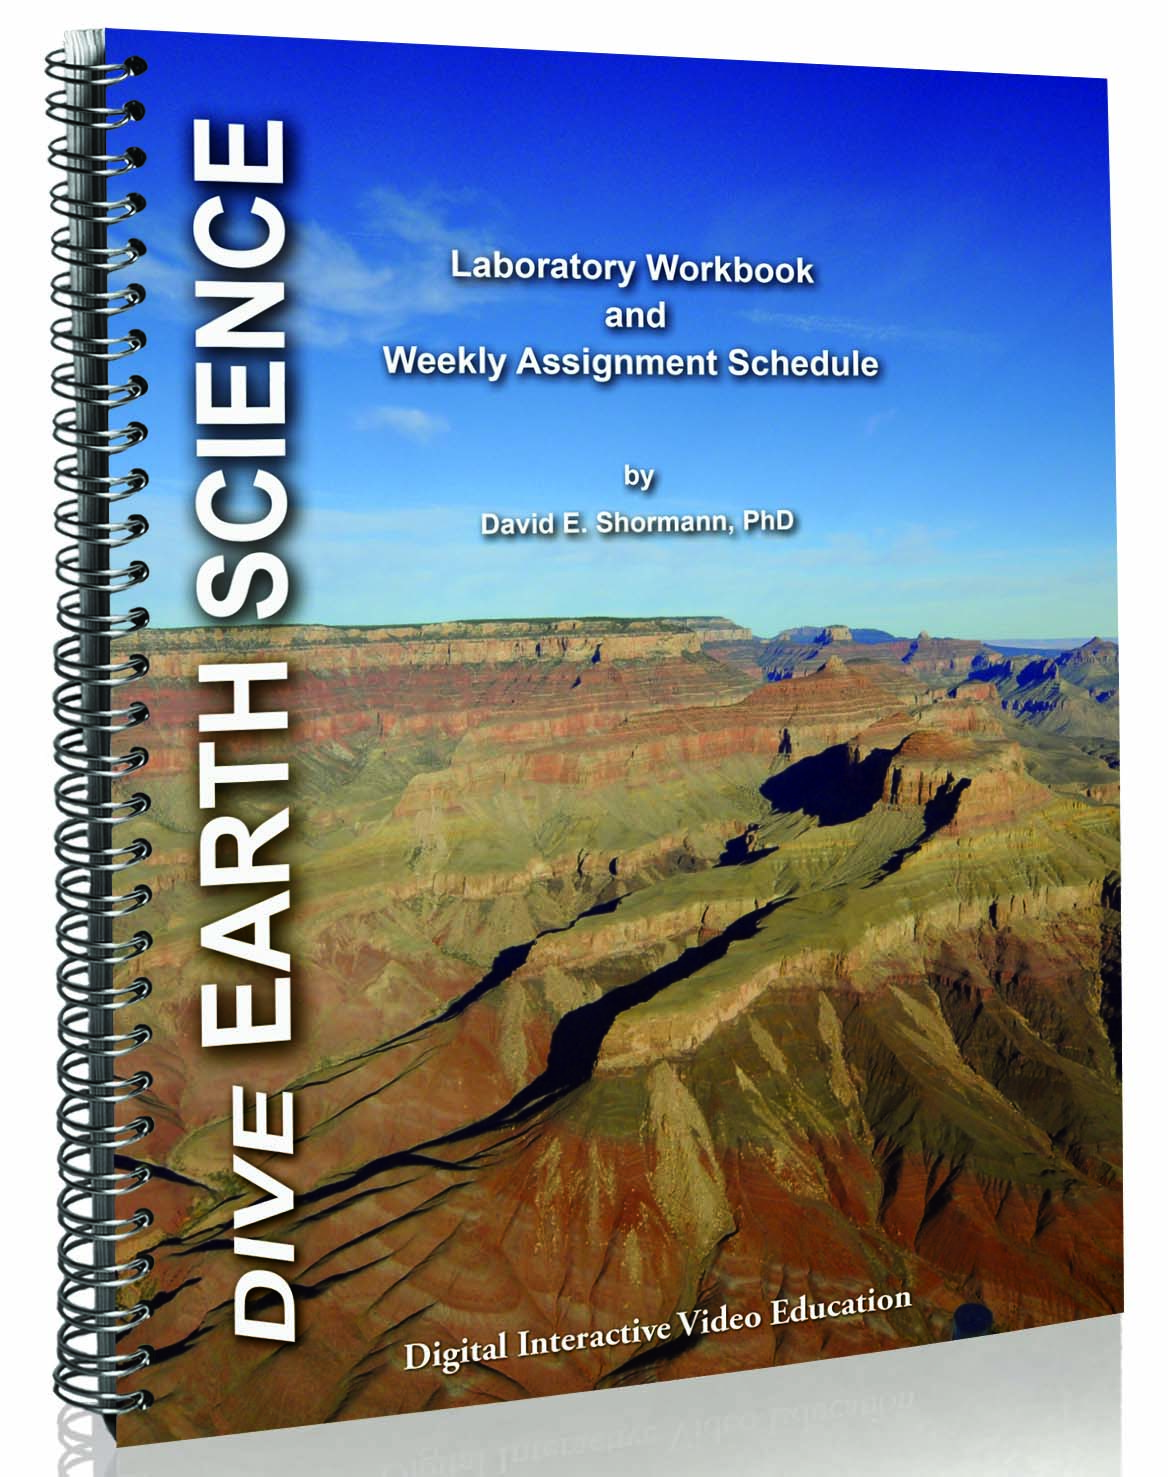 earth-science-lab-workbook-no-bg-300-dpi-cmyk.jpg